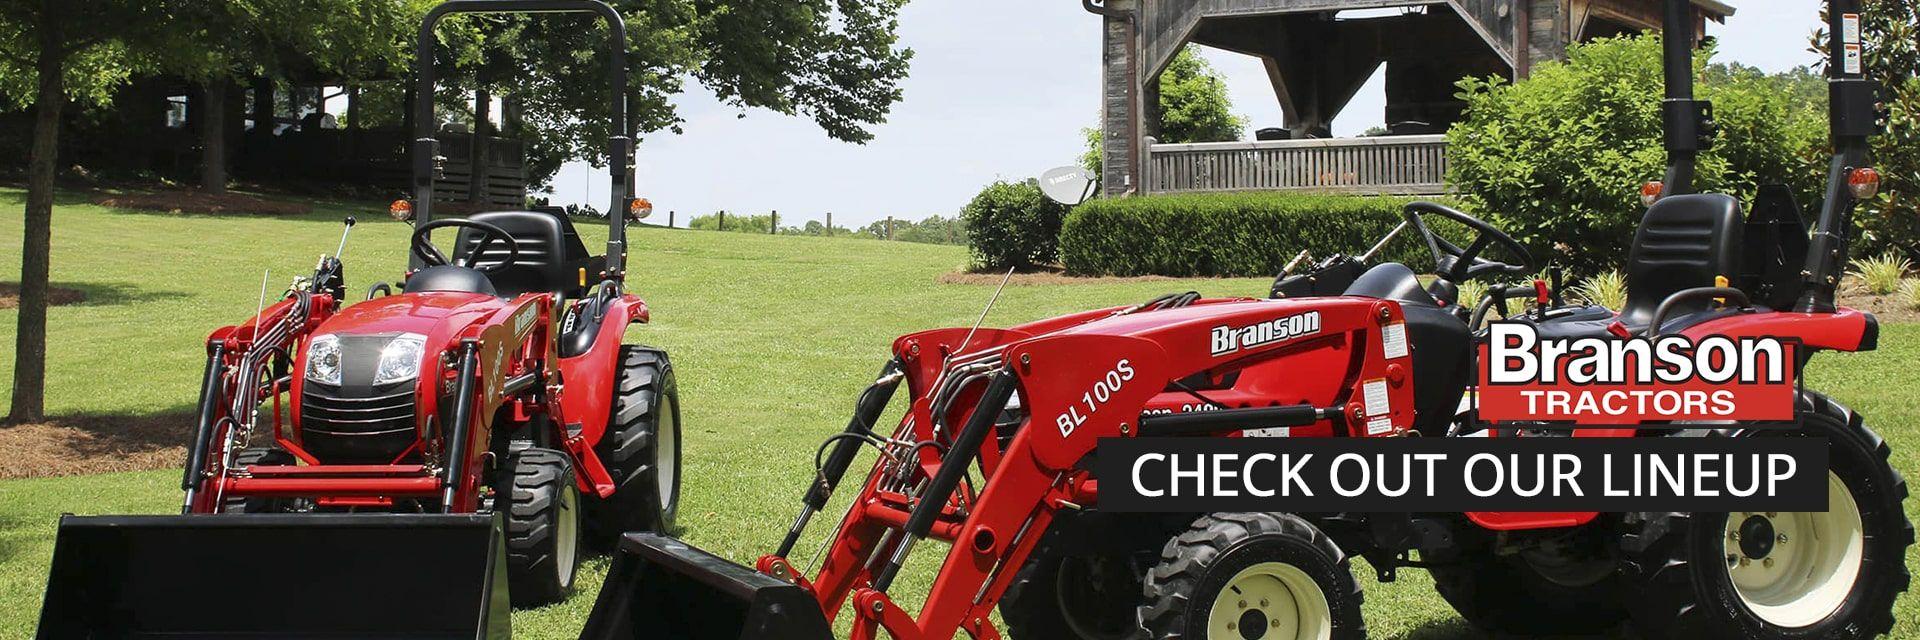 Branson Tractor Lineup